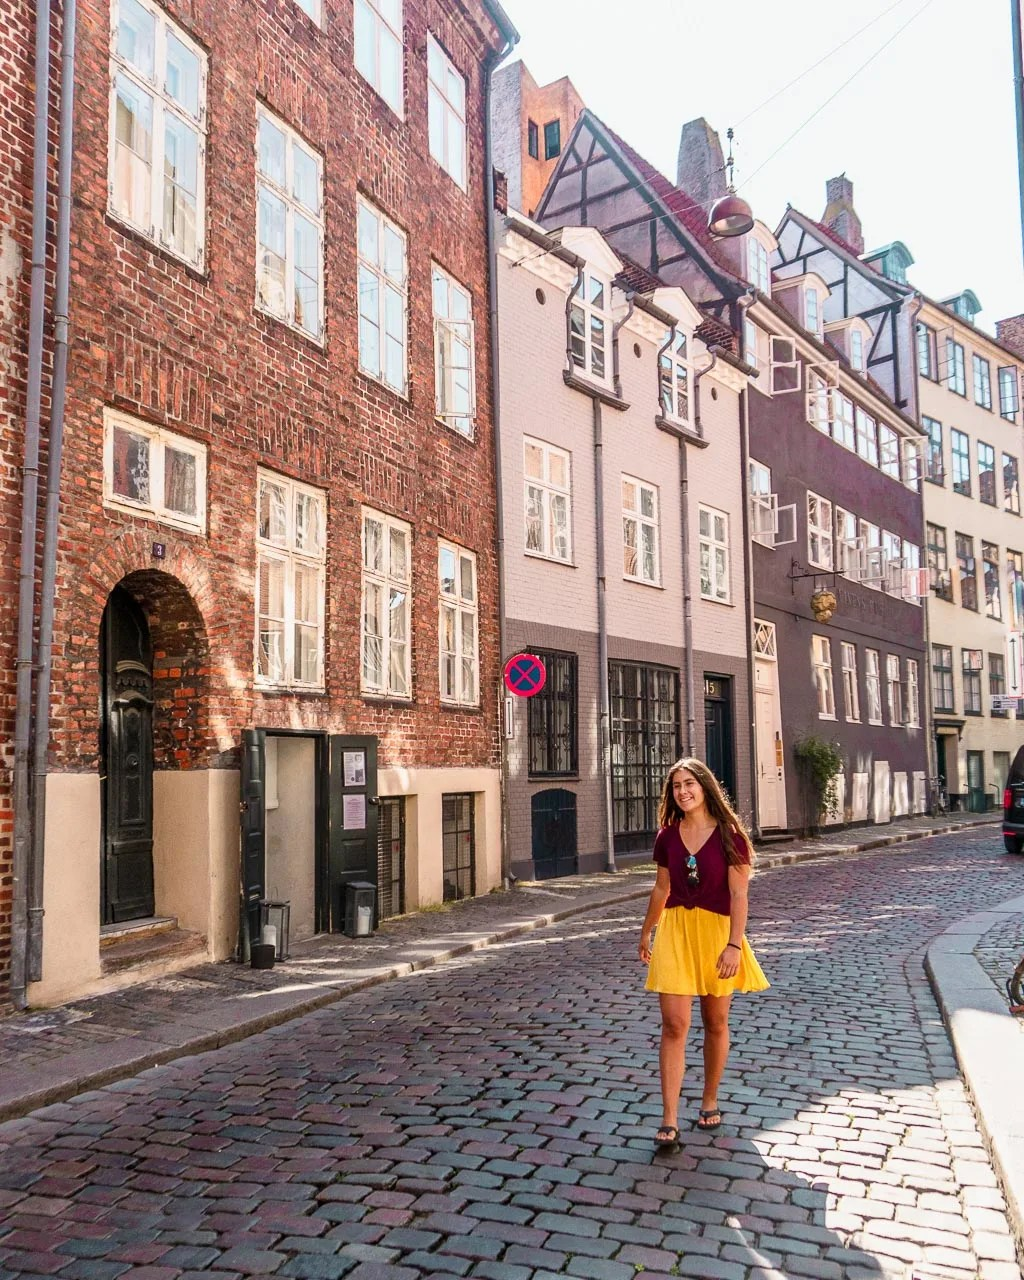 Magstræde, 1 Day Copenhagen Itinerary